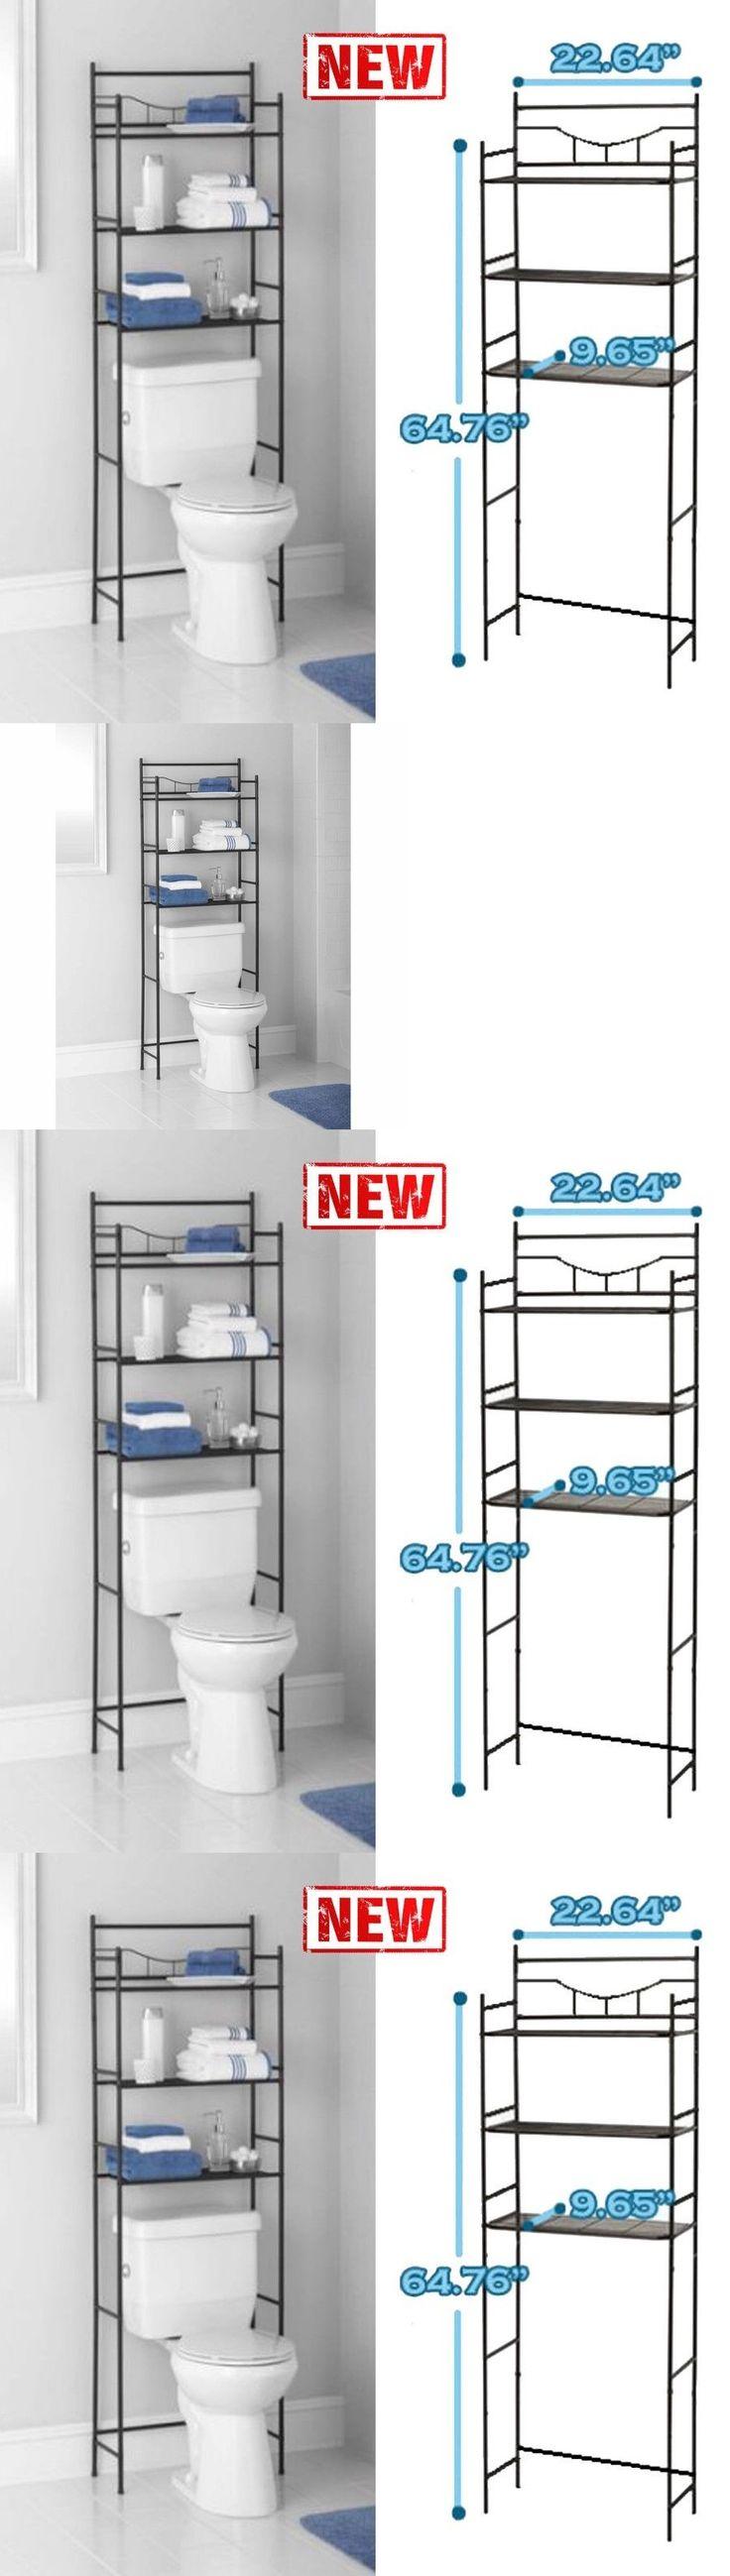 Wrought iron bathroom space saver - Bath Caddies And Storage 54075 3 Shelf Over The Toilet Bathroom Space Saver Organizer Metal